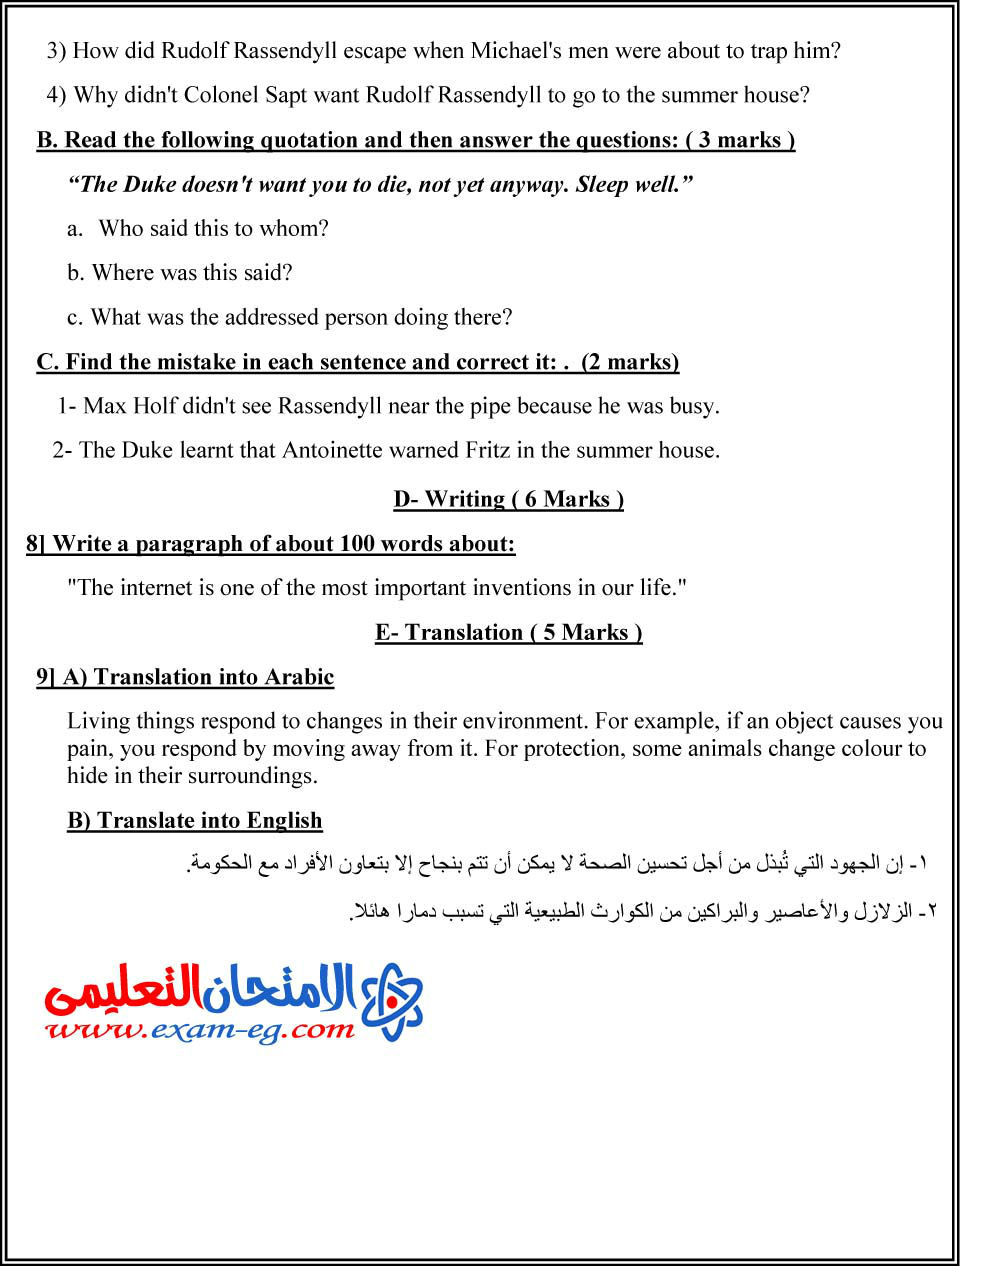 exam-eg.com_1396622718845.jpg